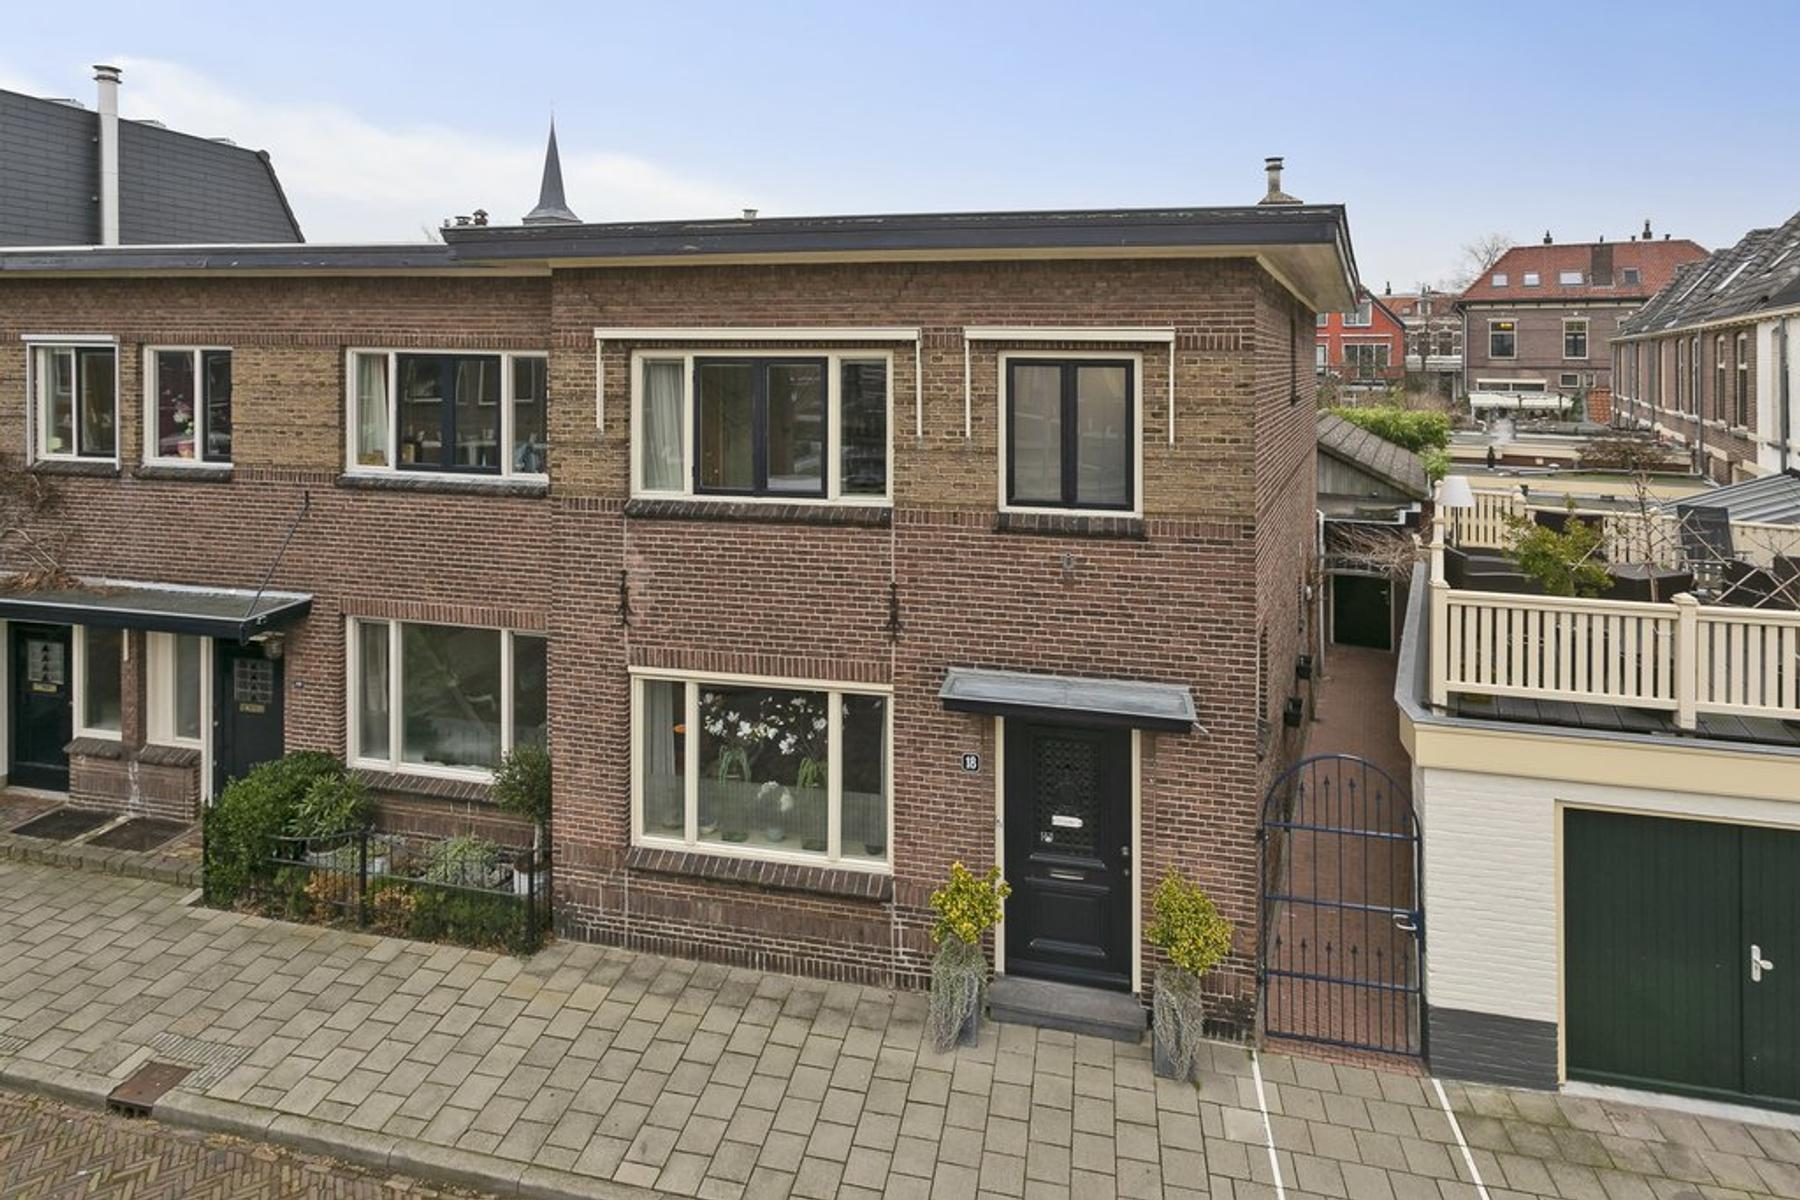 1E Weerdsweg 18 in Deventer 7412 WT